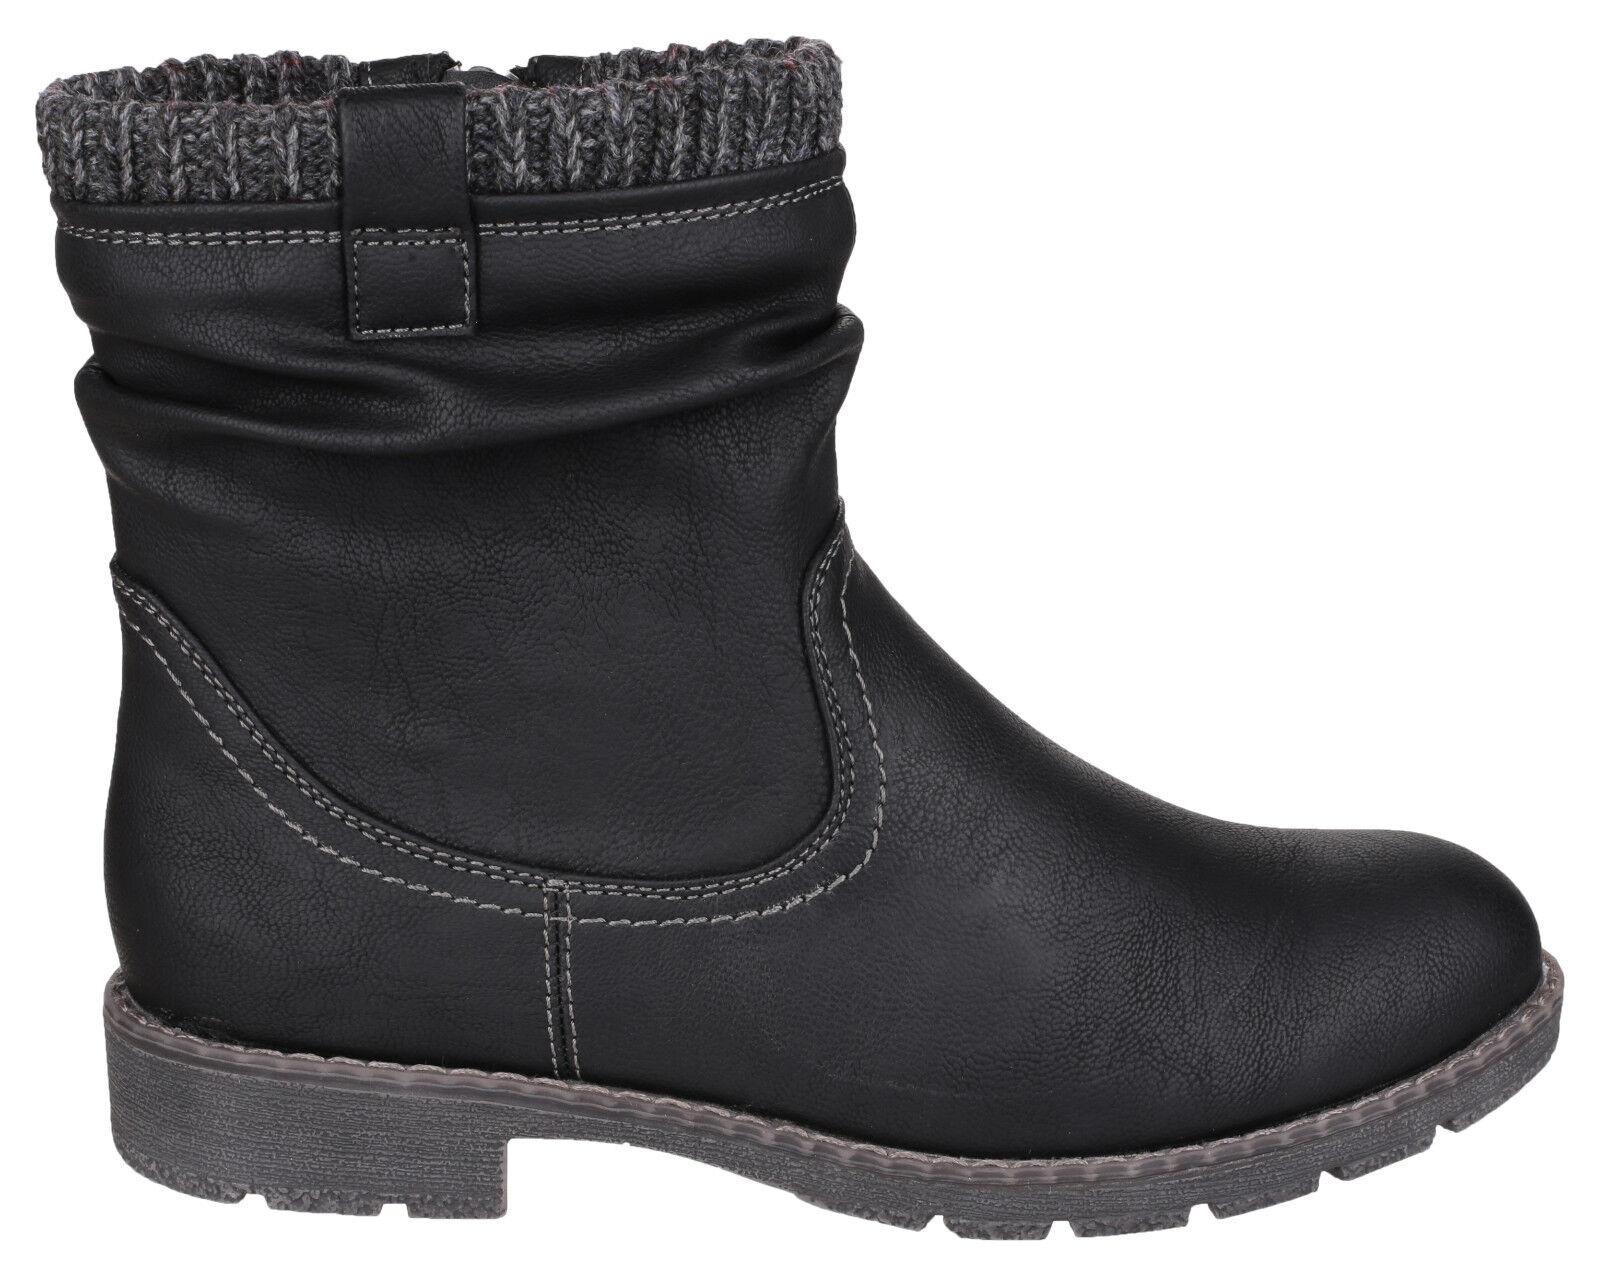 Divaz Lucca Mid Calf Zip Up Damenschuhe Schuhes Smart Casual Fashion Stiefel Schuhes Damenschuhe UK3-8 60e499